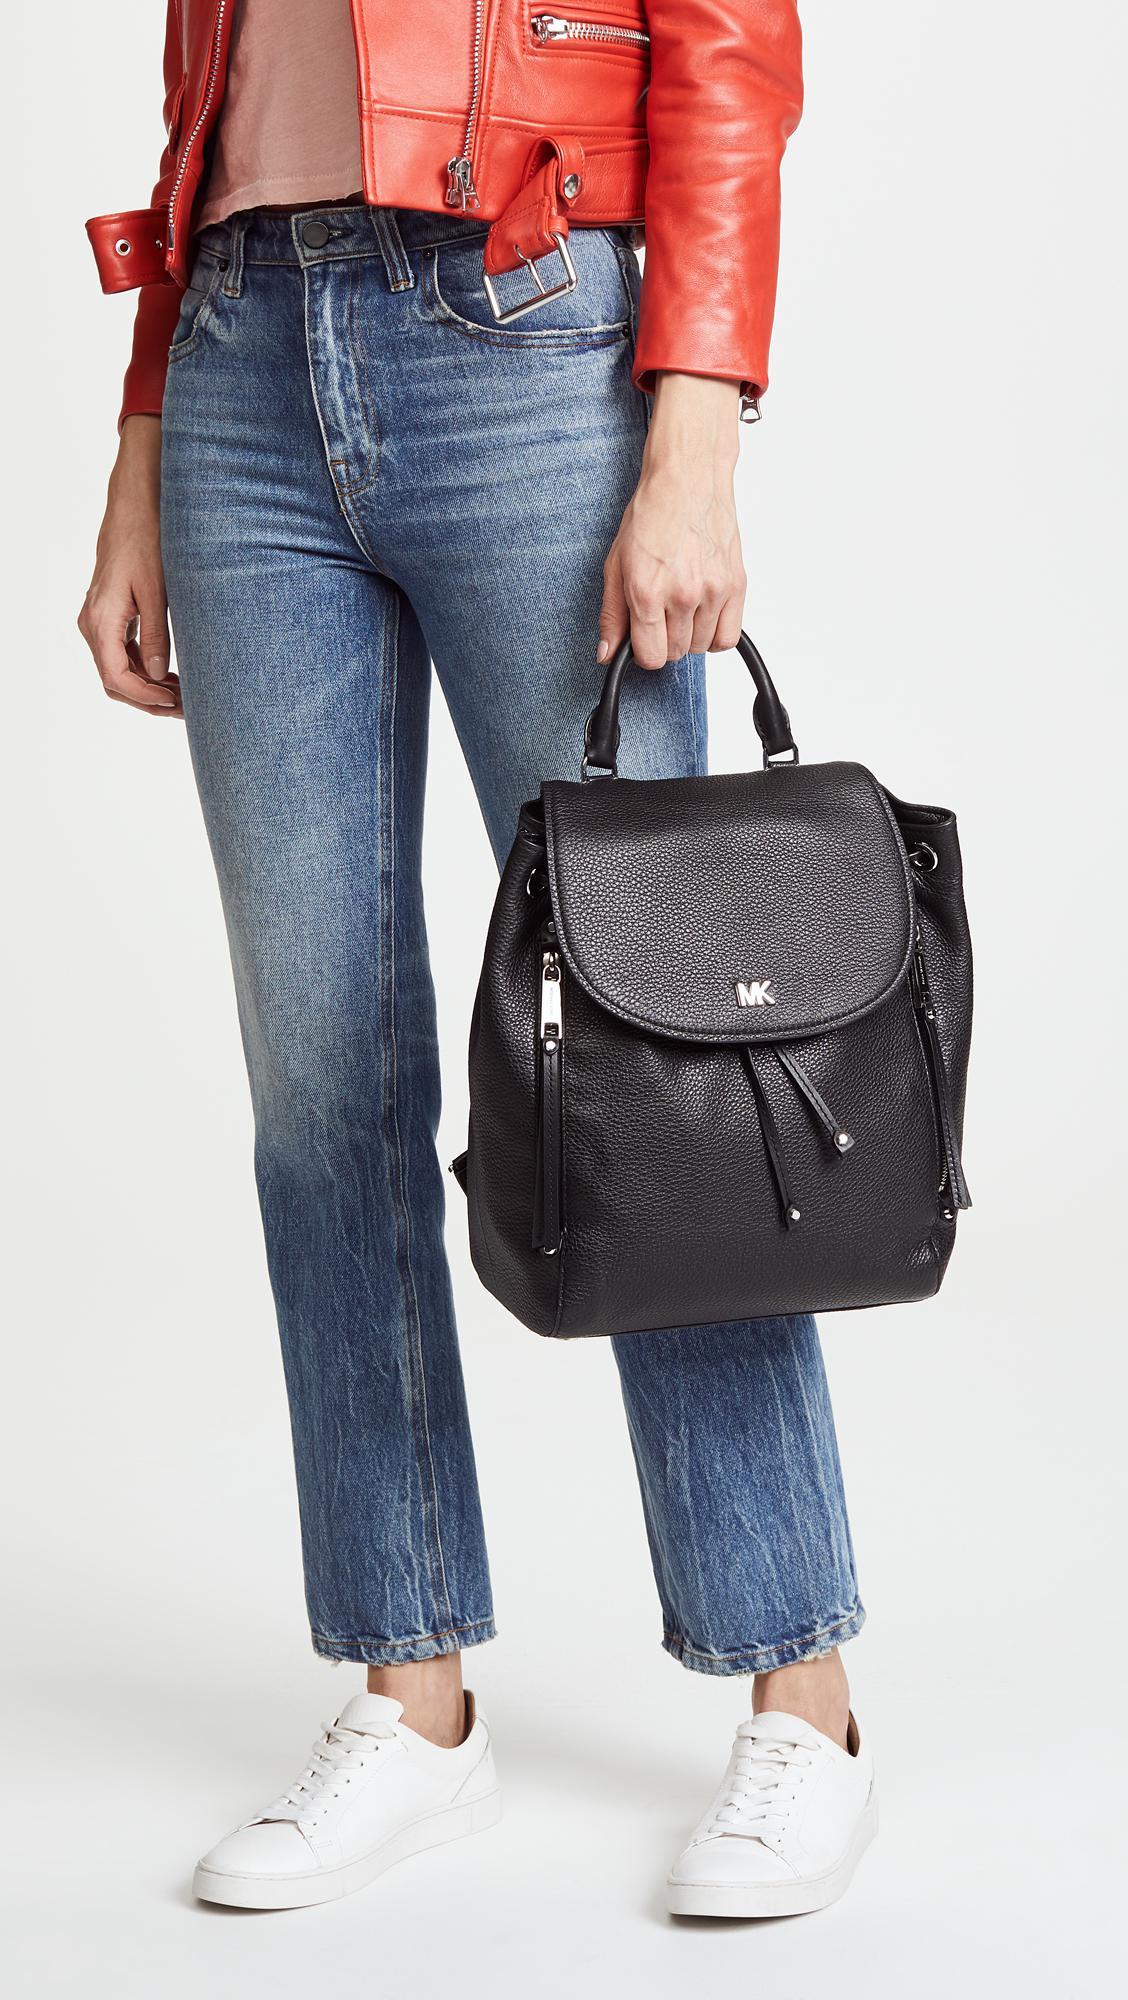 46e57fb36f6525 MICHAEL Michael Kors Evie Medium Backpack in Black - Lyst